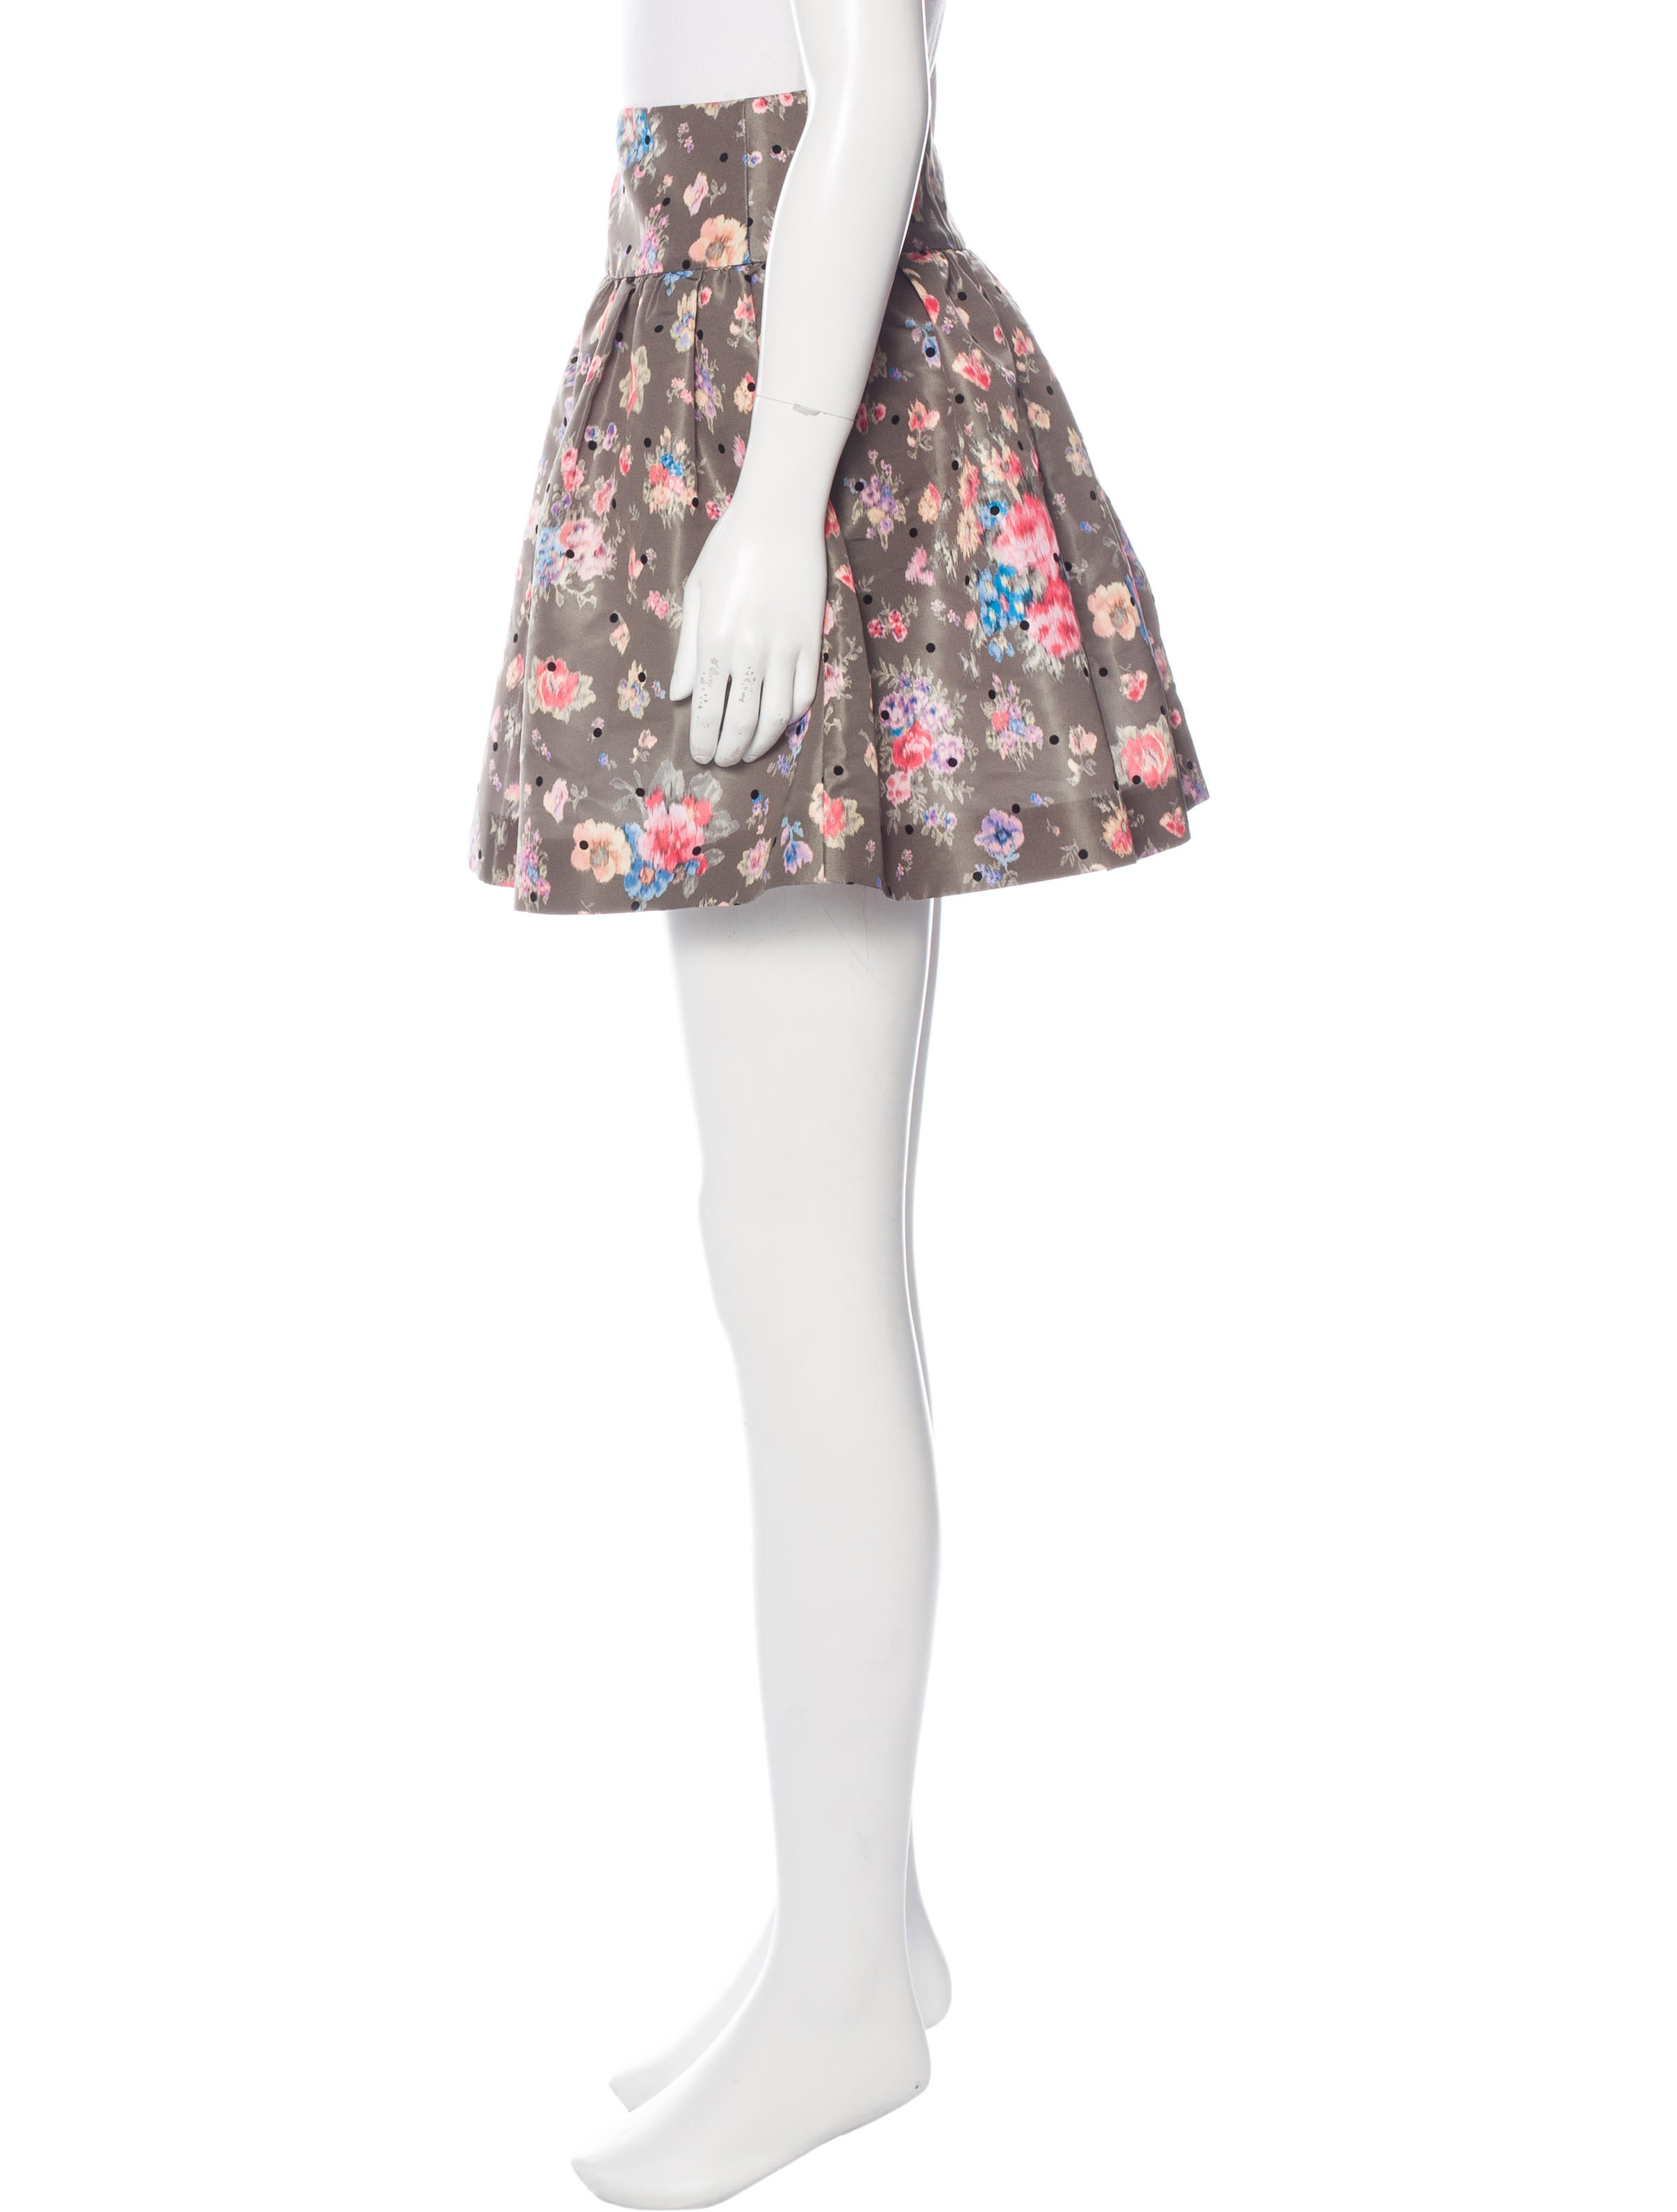 Floral Print Mini Skirt 108